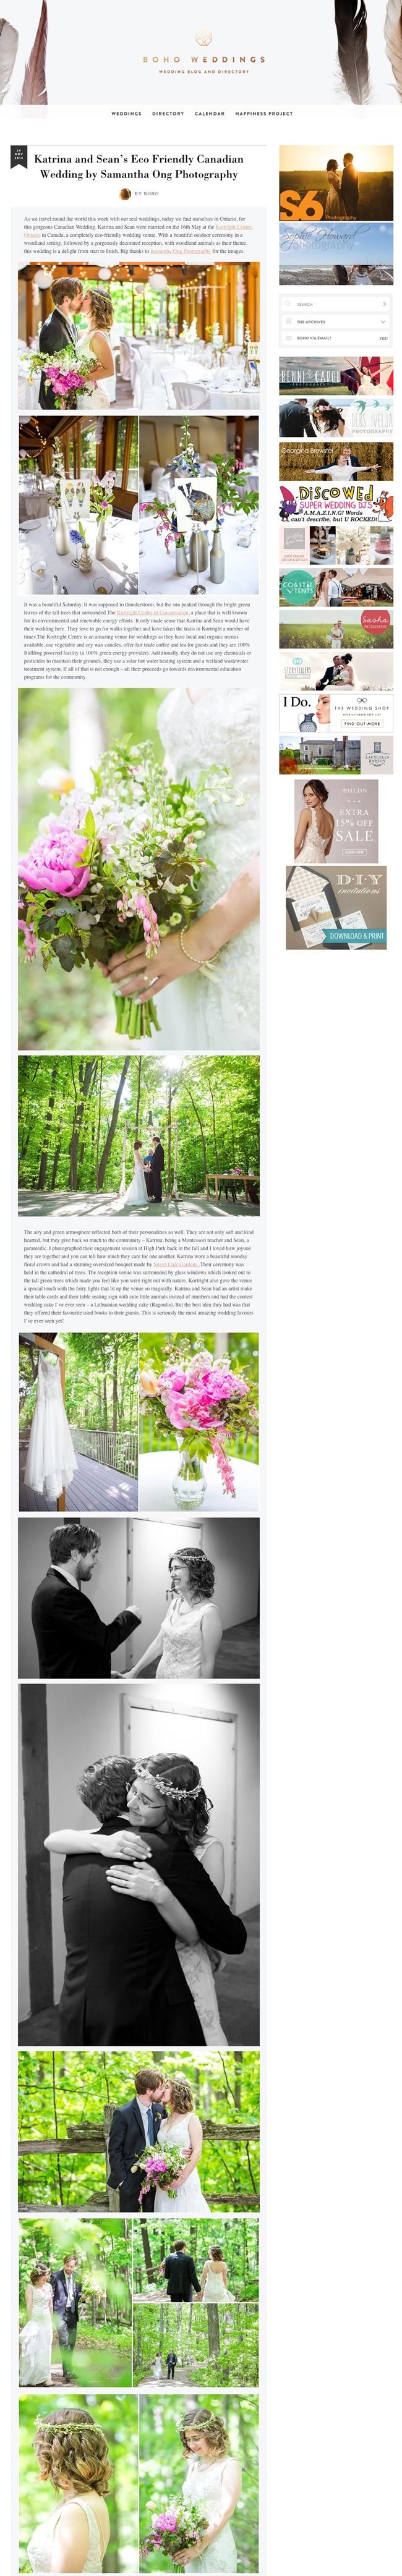 kortright-eco-friendly-boho-wedding-photos